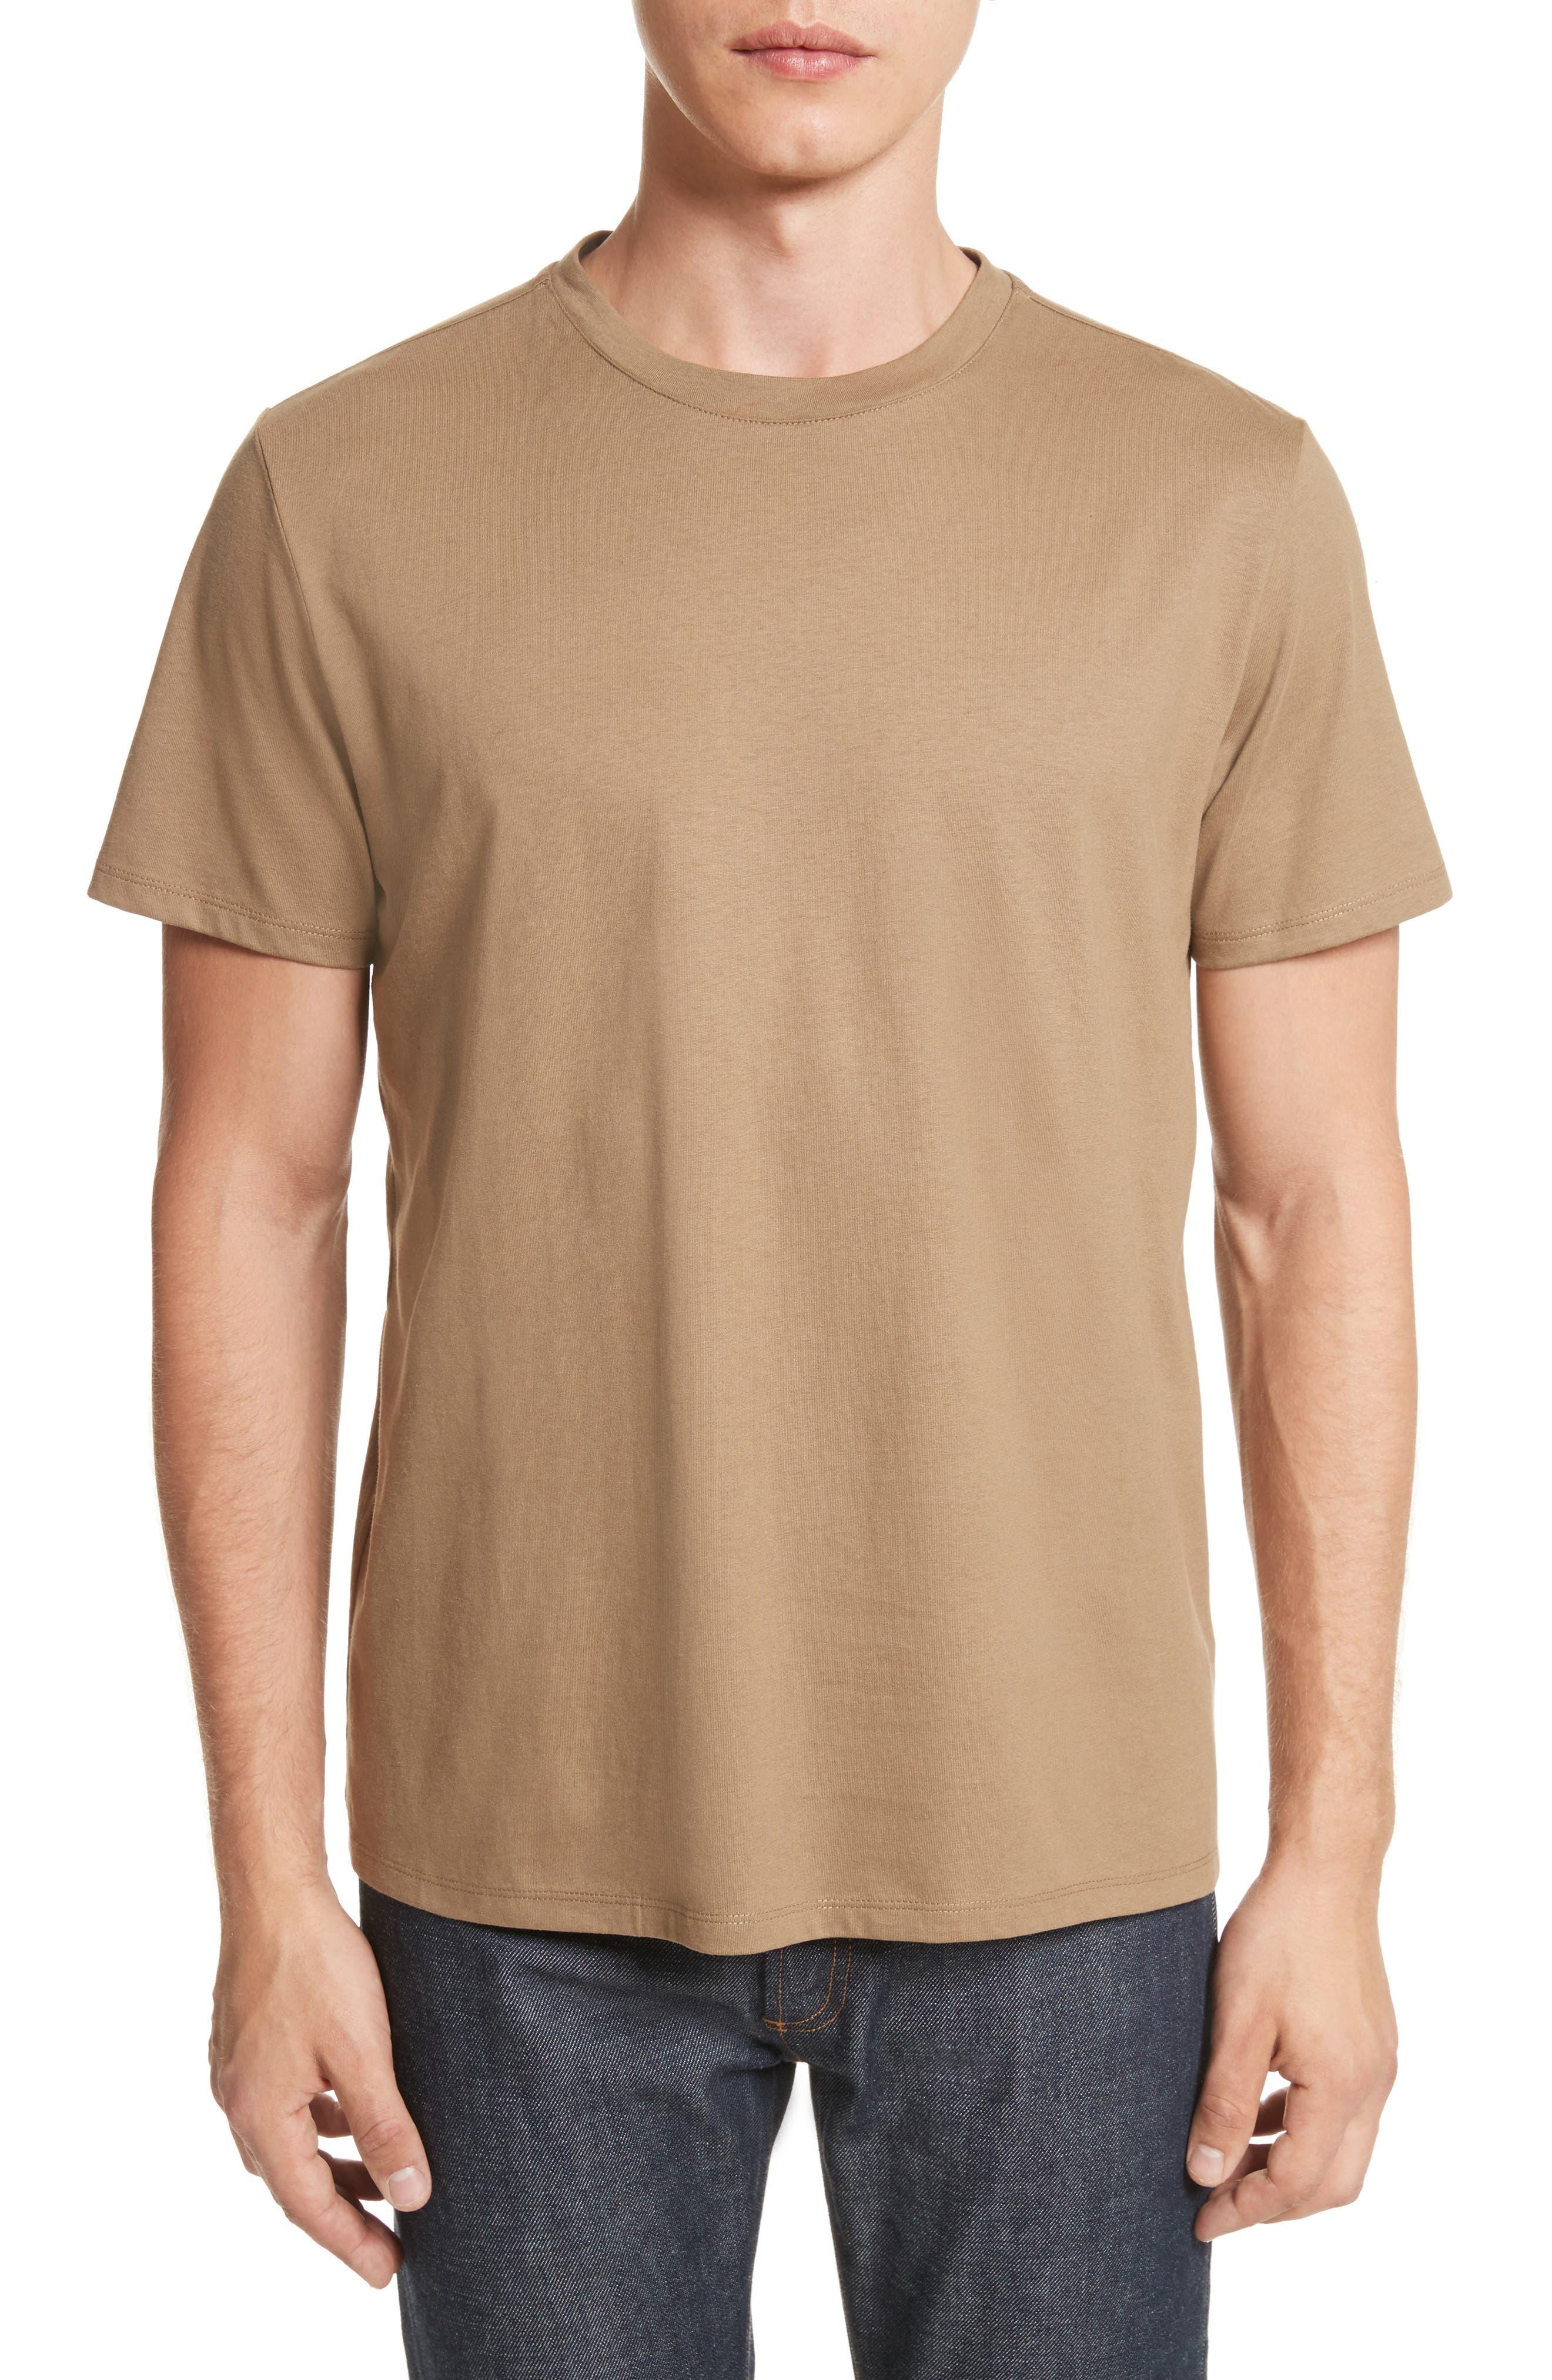 Jimmy T-Shirt,                         Main,                         color,